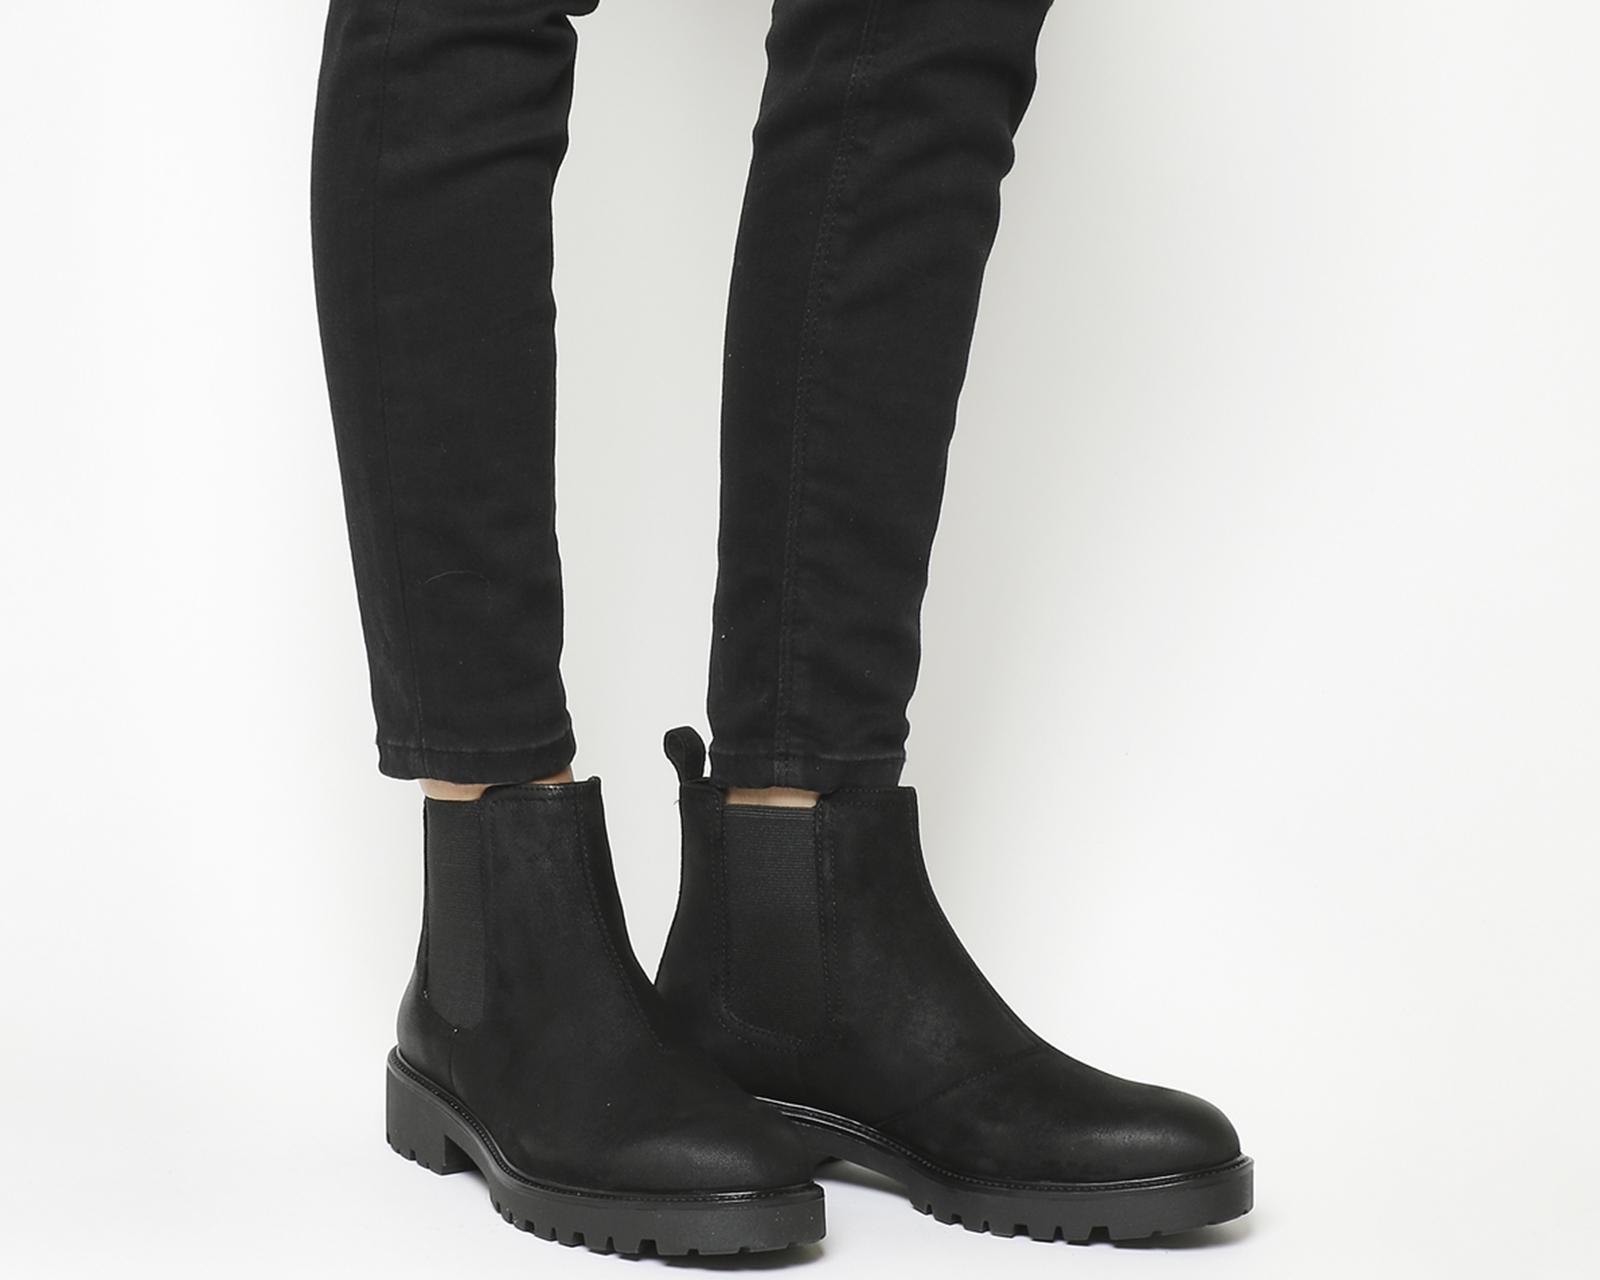 Lyst - Vagabond Kenova Chelsea Boots in Black